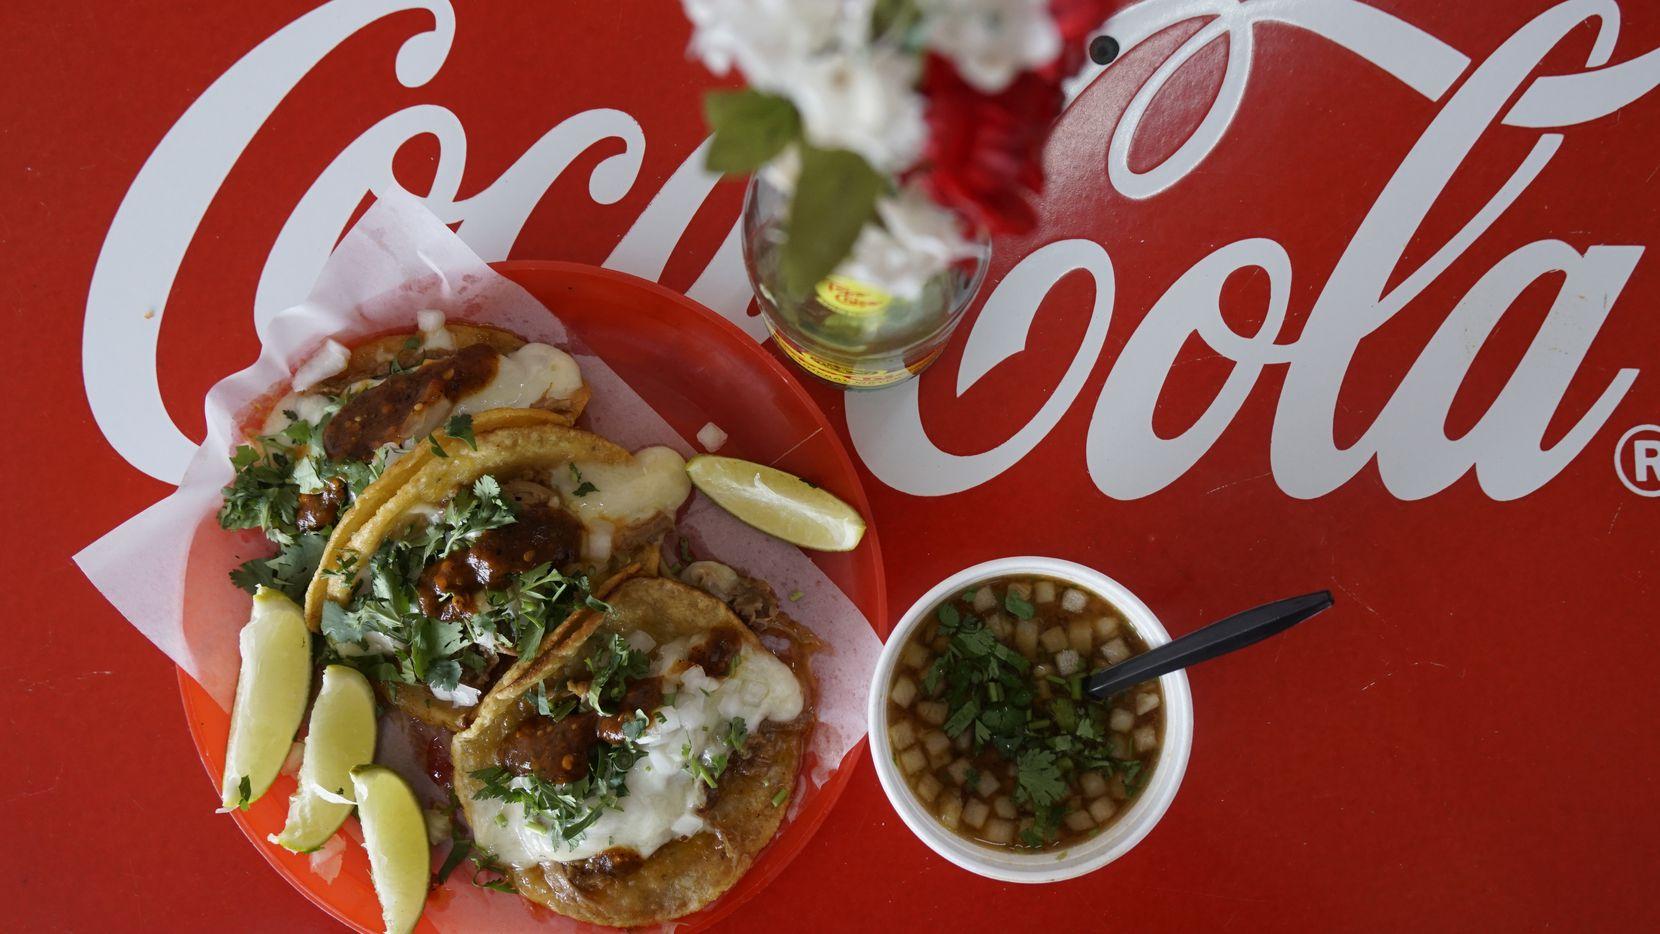 Quesobirria taco at Chilangos Tacos on Harry Hines in Dallas